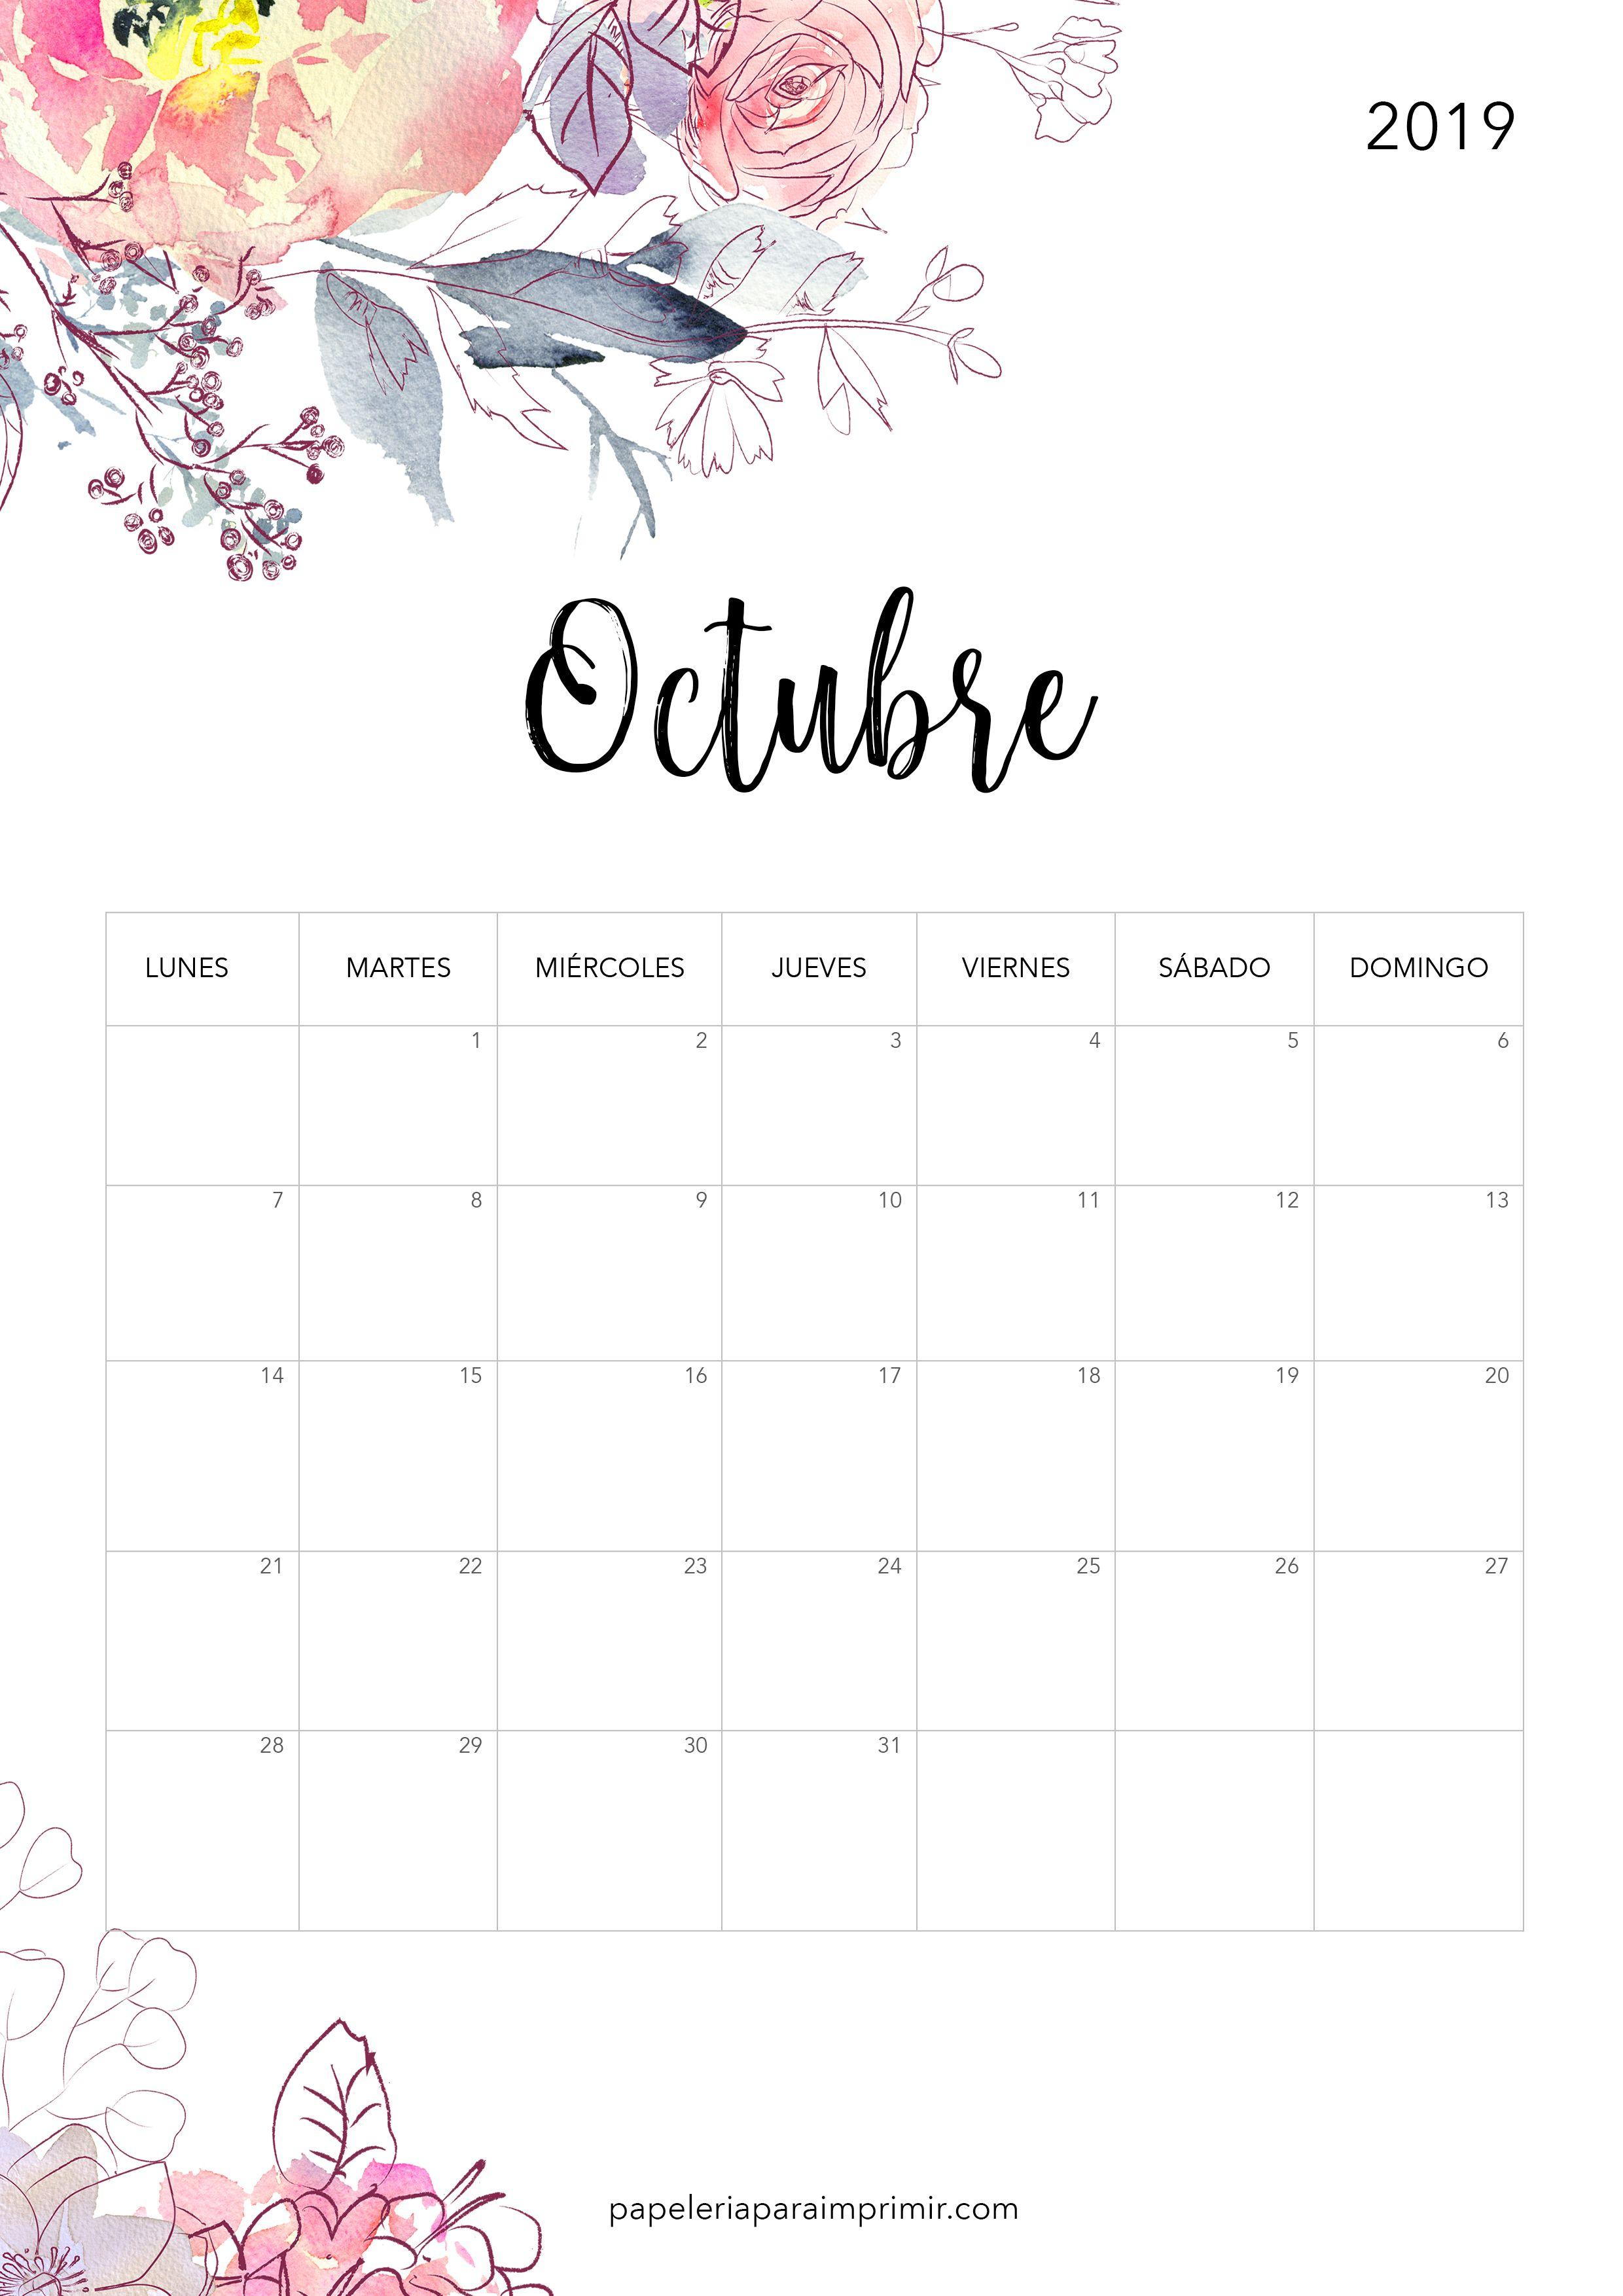 Calendario De Septiembre 2019 Para Imprimir Animado.Calendario Para Imprimir Octubre 2019 Calendario Imprimir